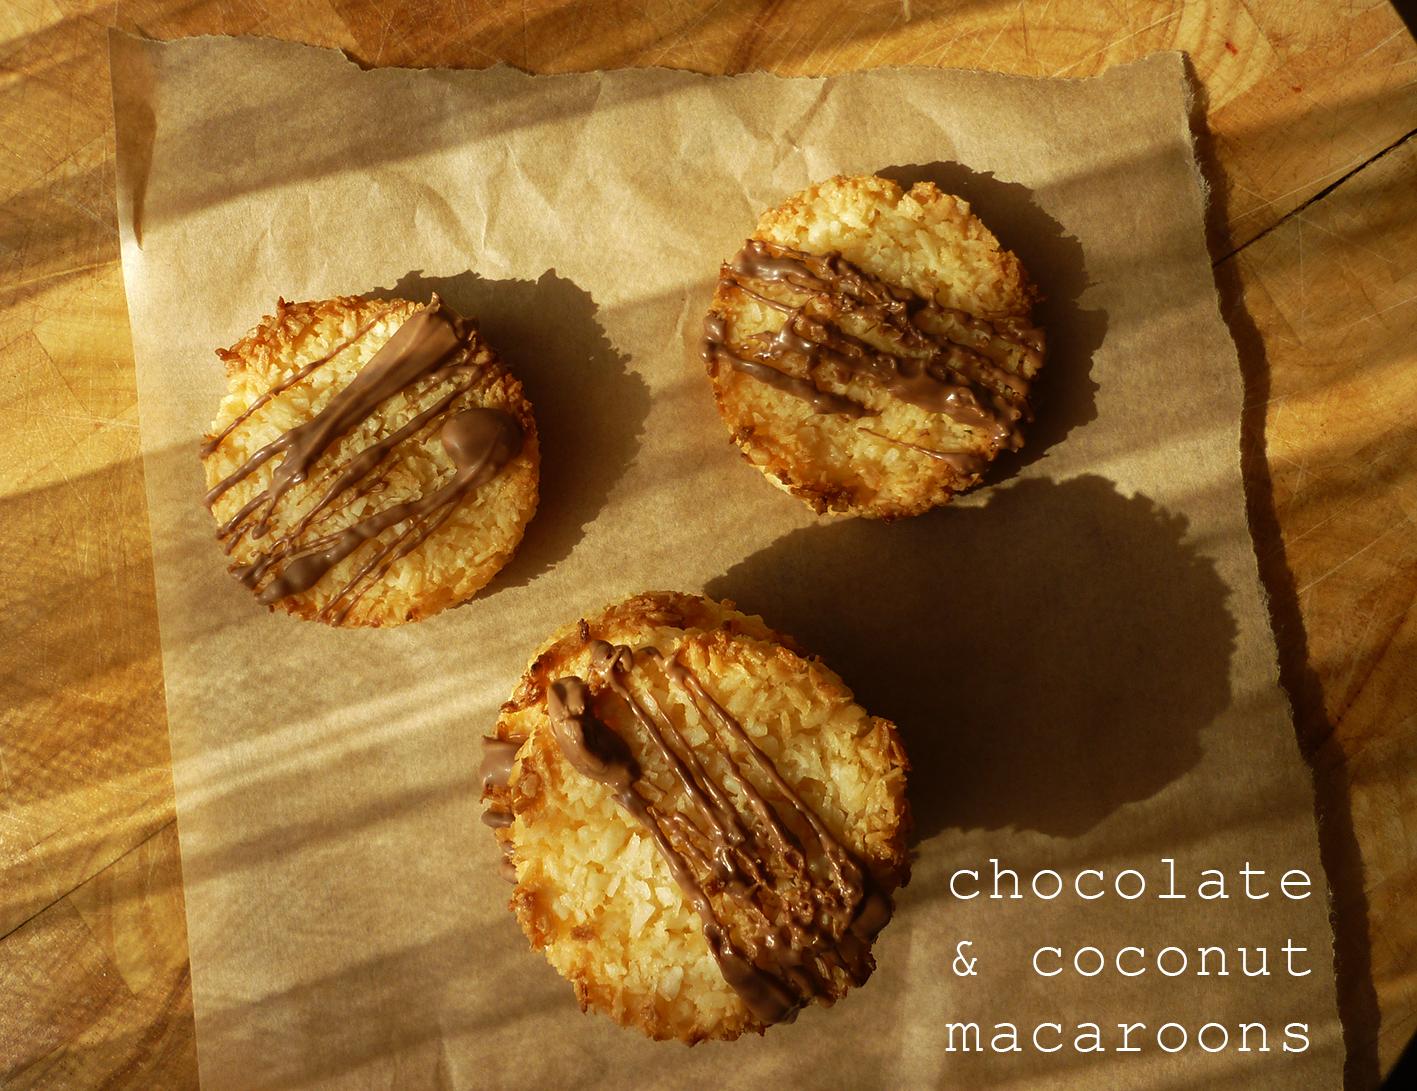 coconut & chocolate macaroons 9